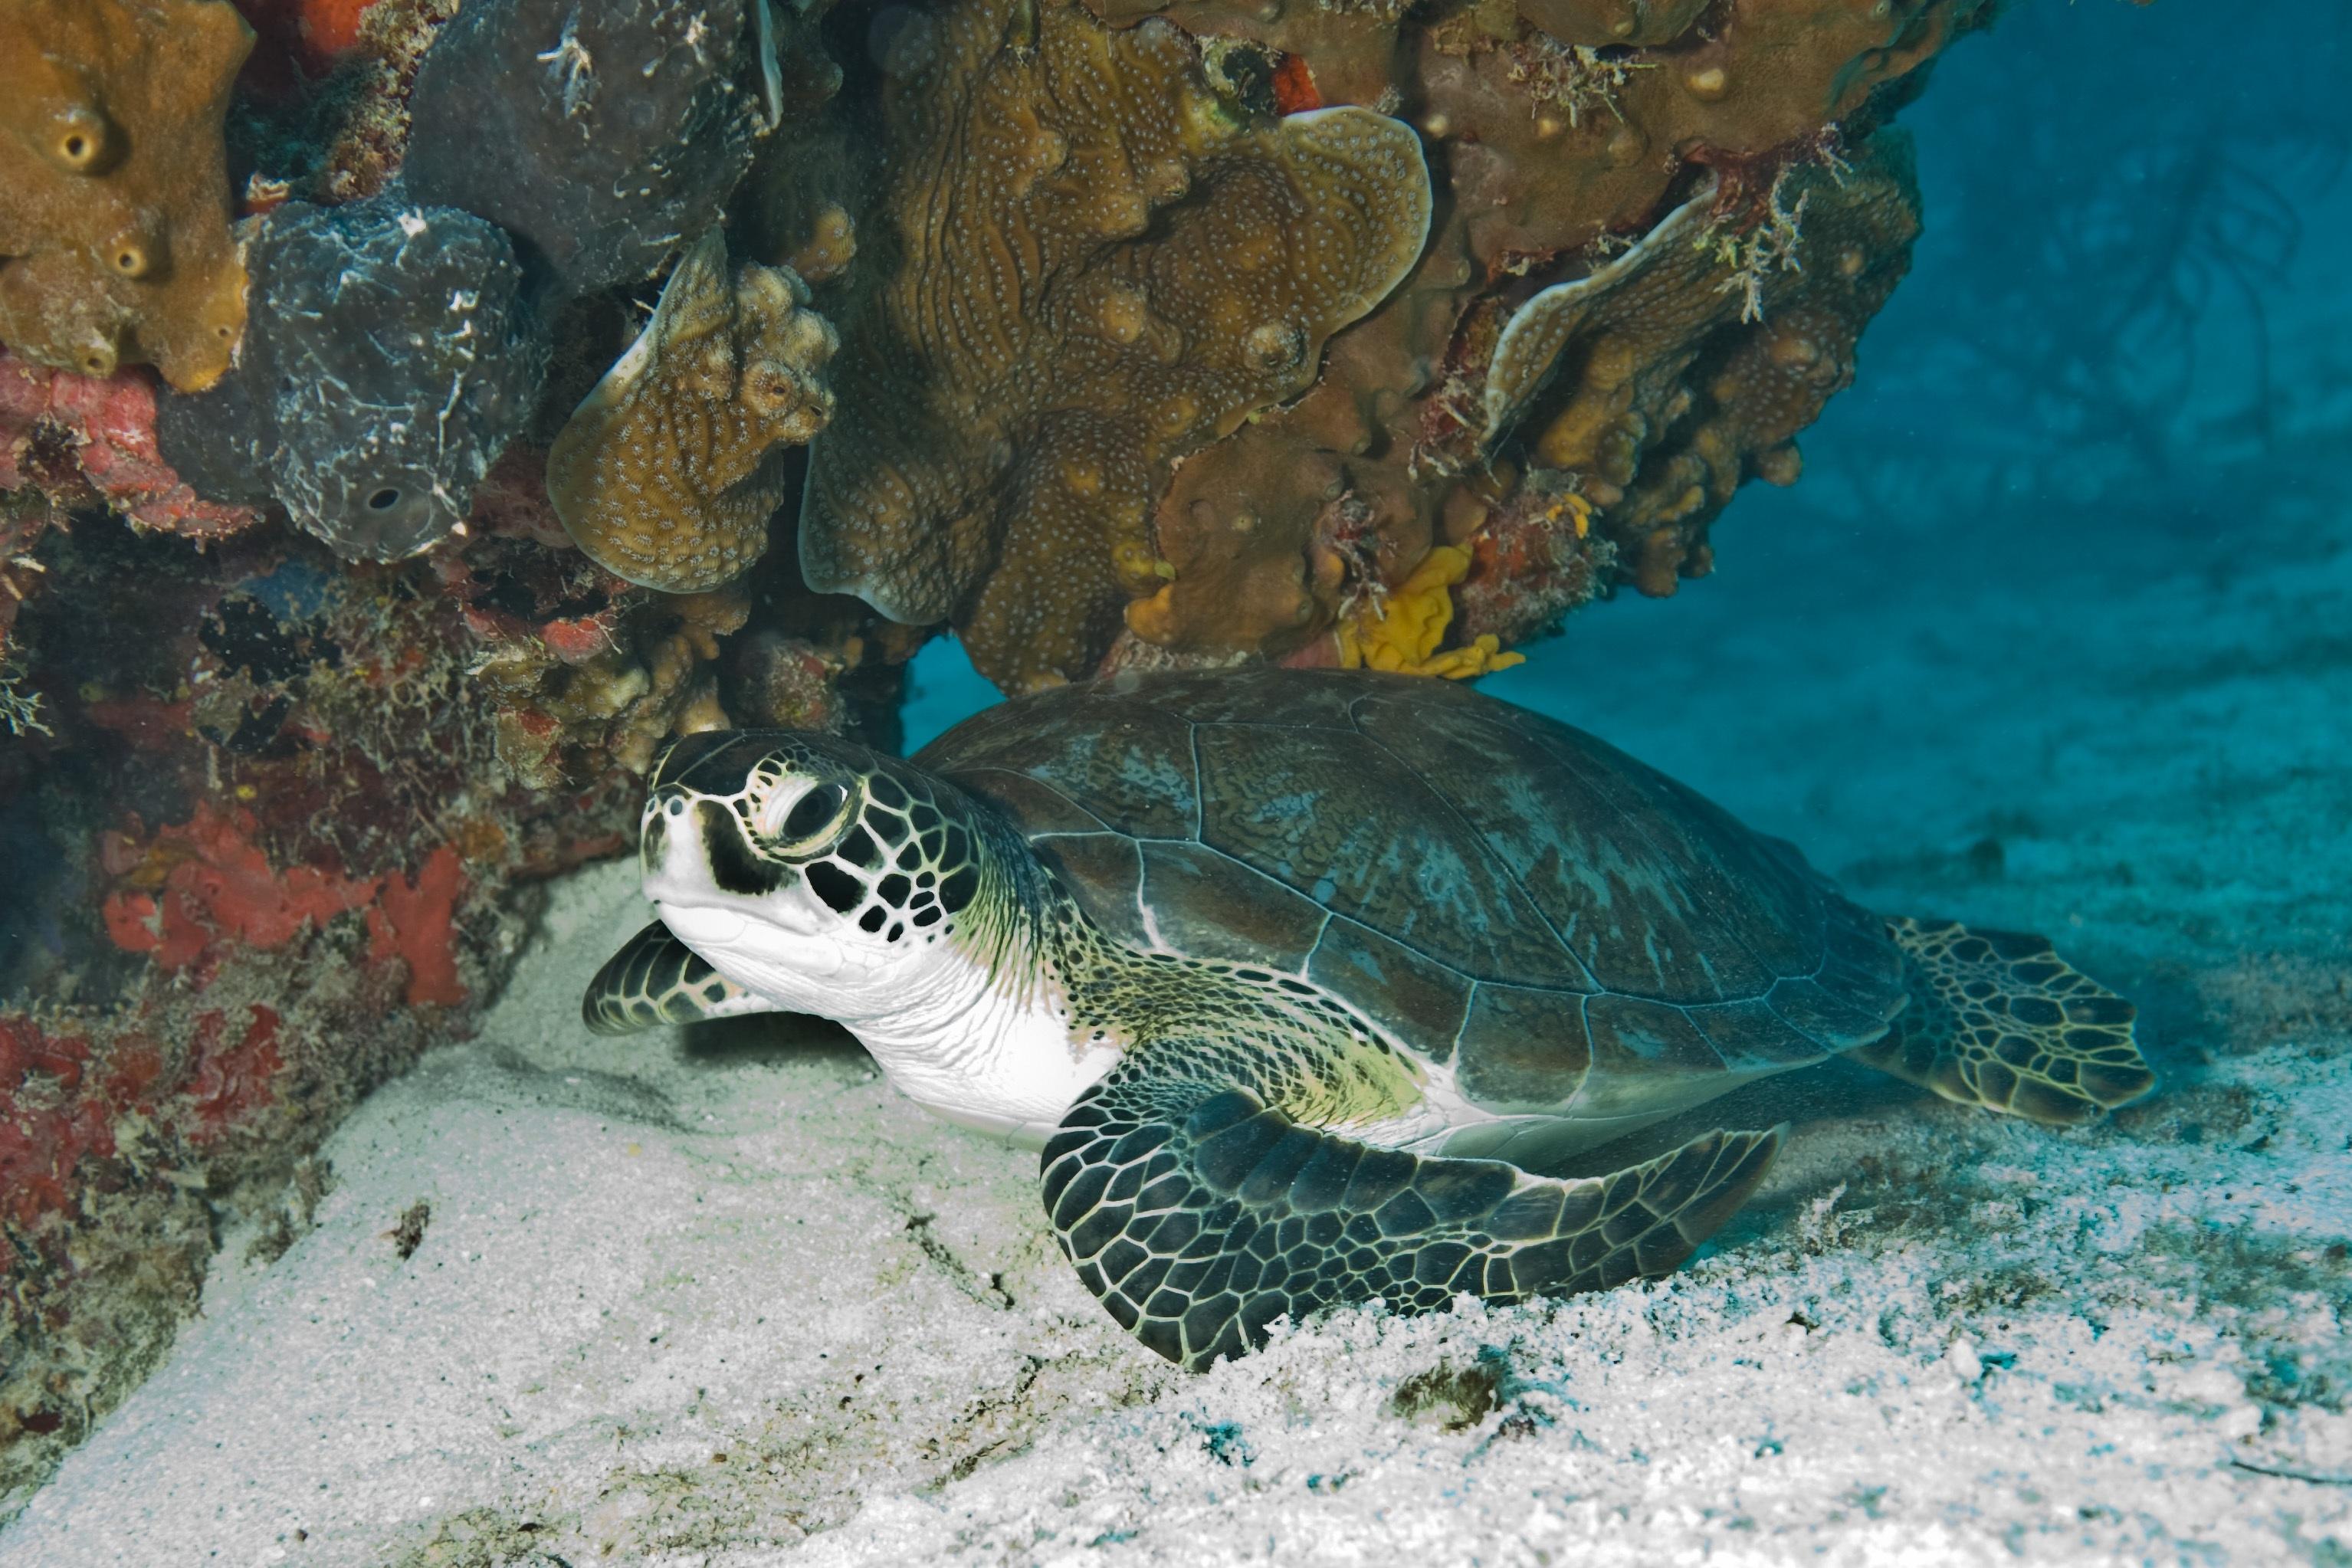 Turtle in the Sea, Animal, Beach, Blue, Nature, HQ Photo